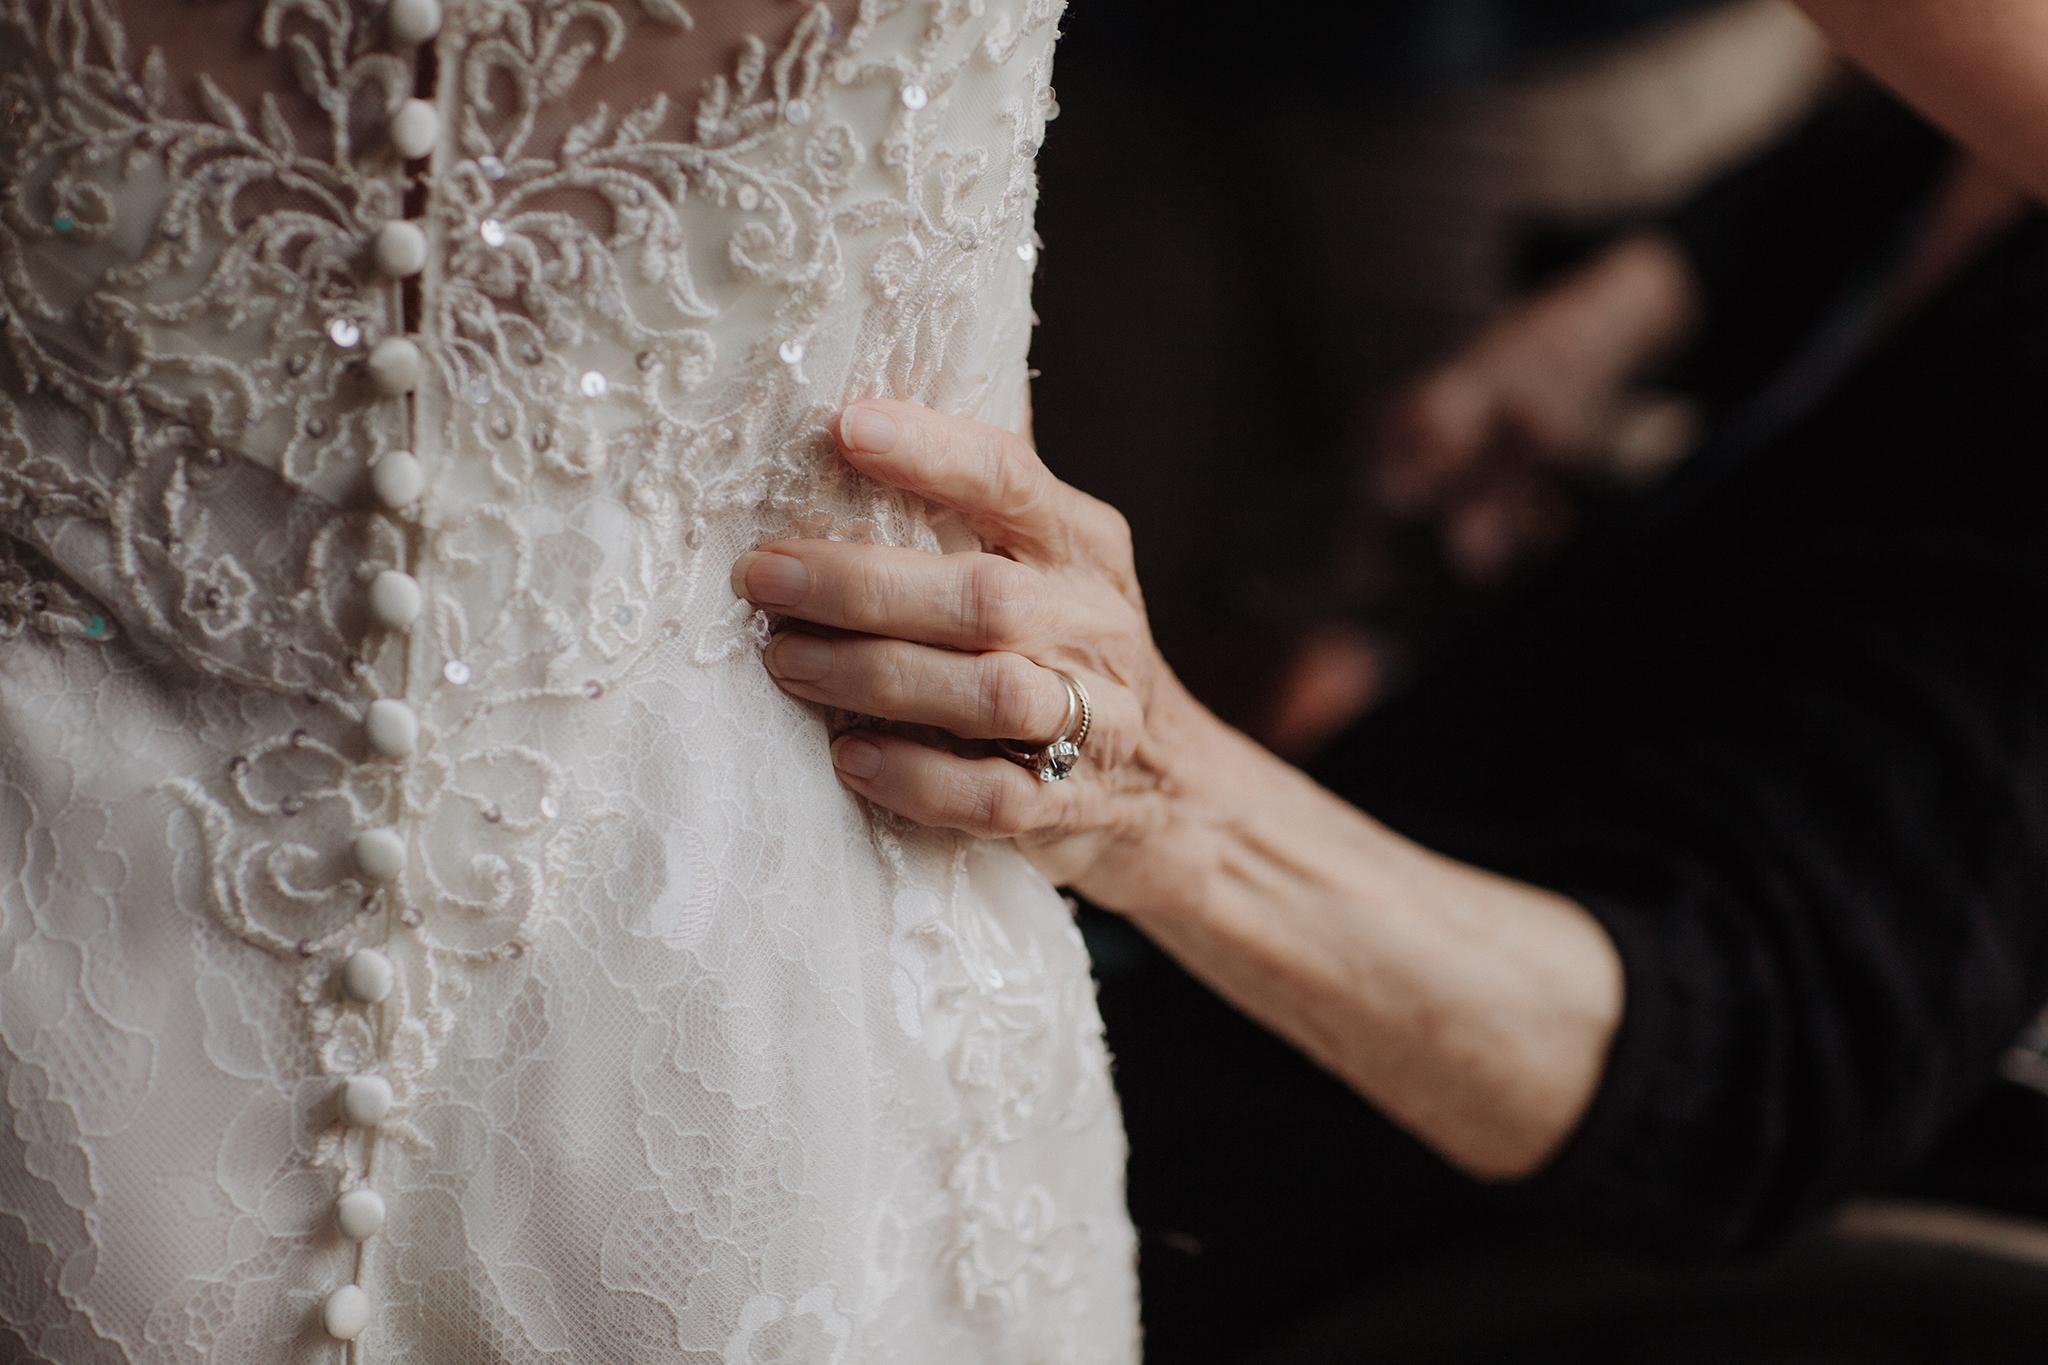 vermont-wedding-photographer-outdoor-farm-wedding-81.jpg